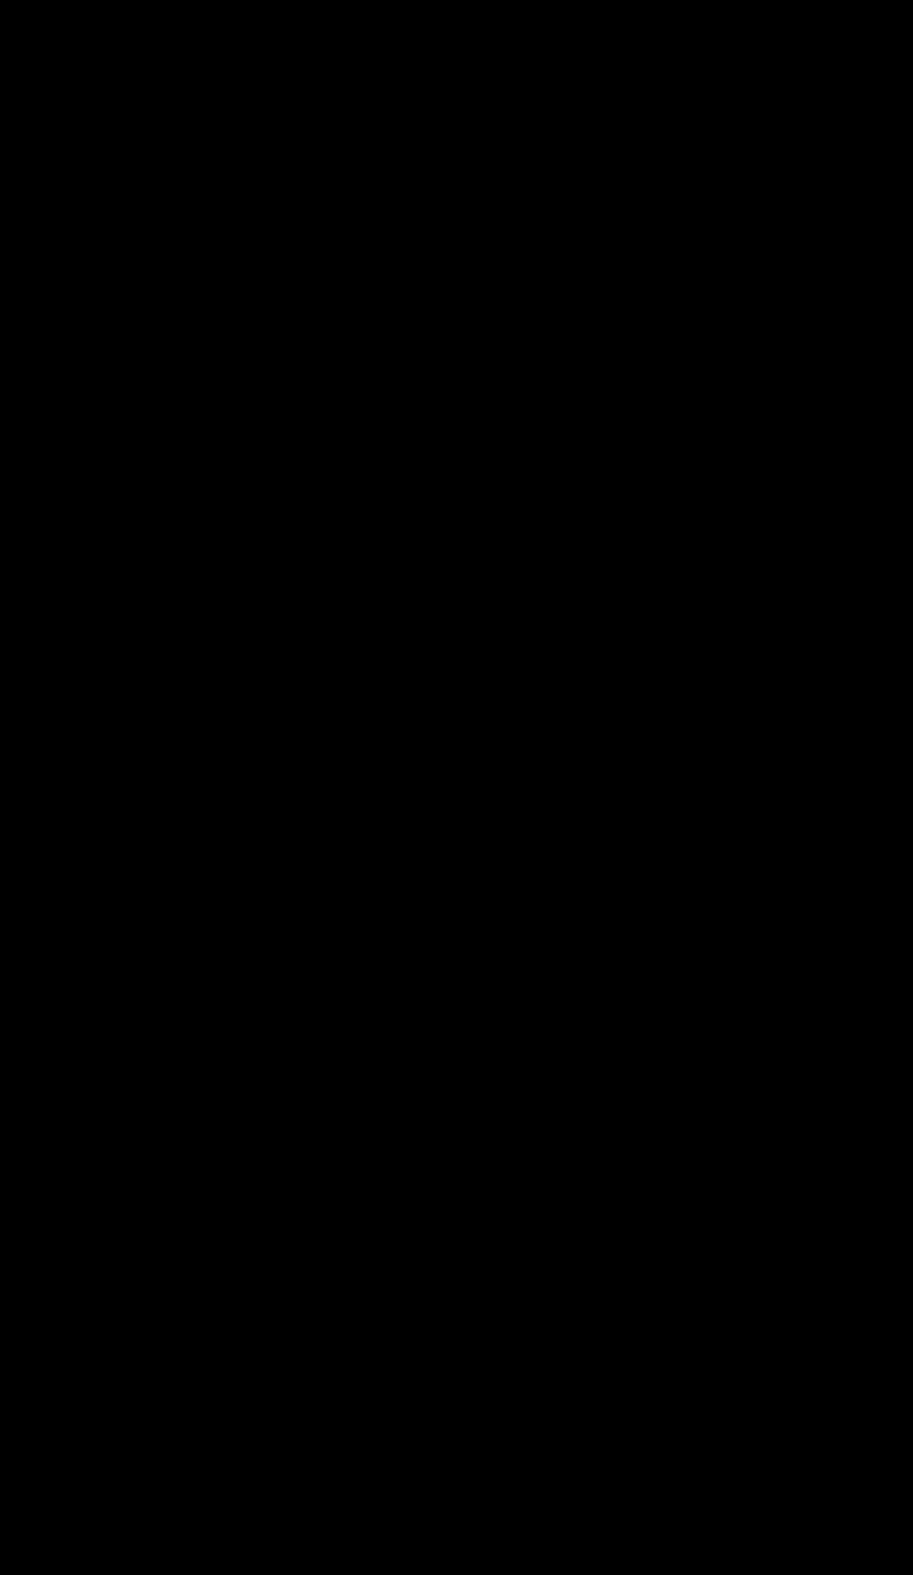 kisspng-symbol-vector-graphics-mourning-black-ribbon-compu-5c56f0607149e6.840207781549201504464